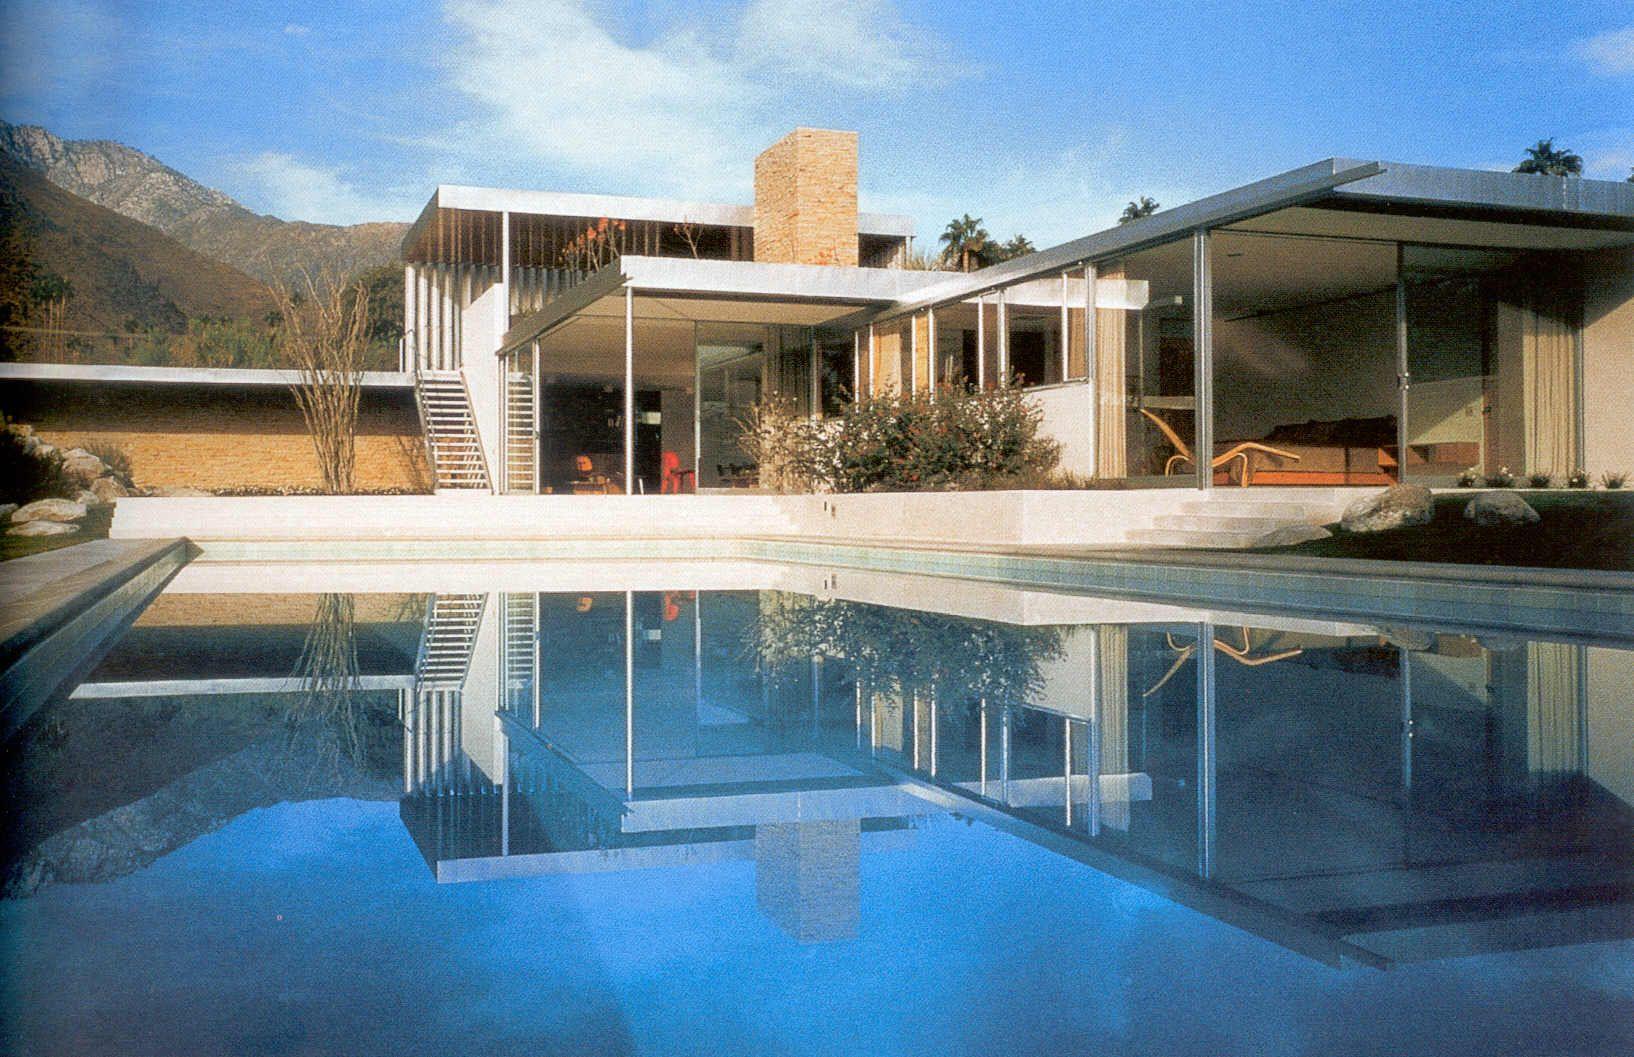 Modern Architecture Palm Springs richard neutra, kaufmann house, palm springs, 1947 | m | pinterest